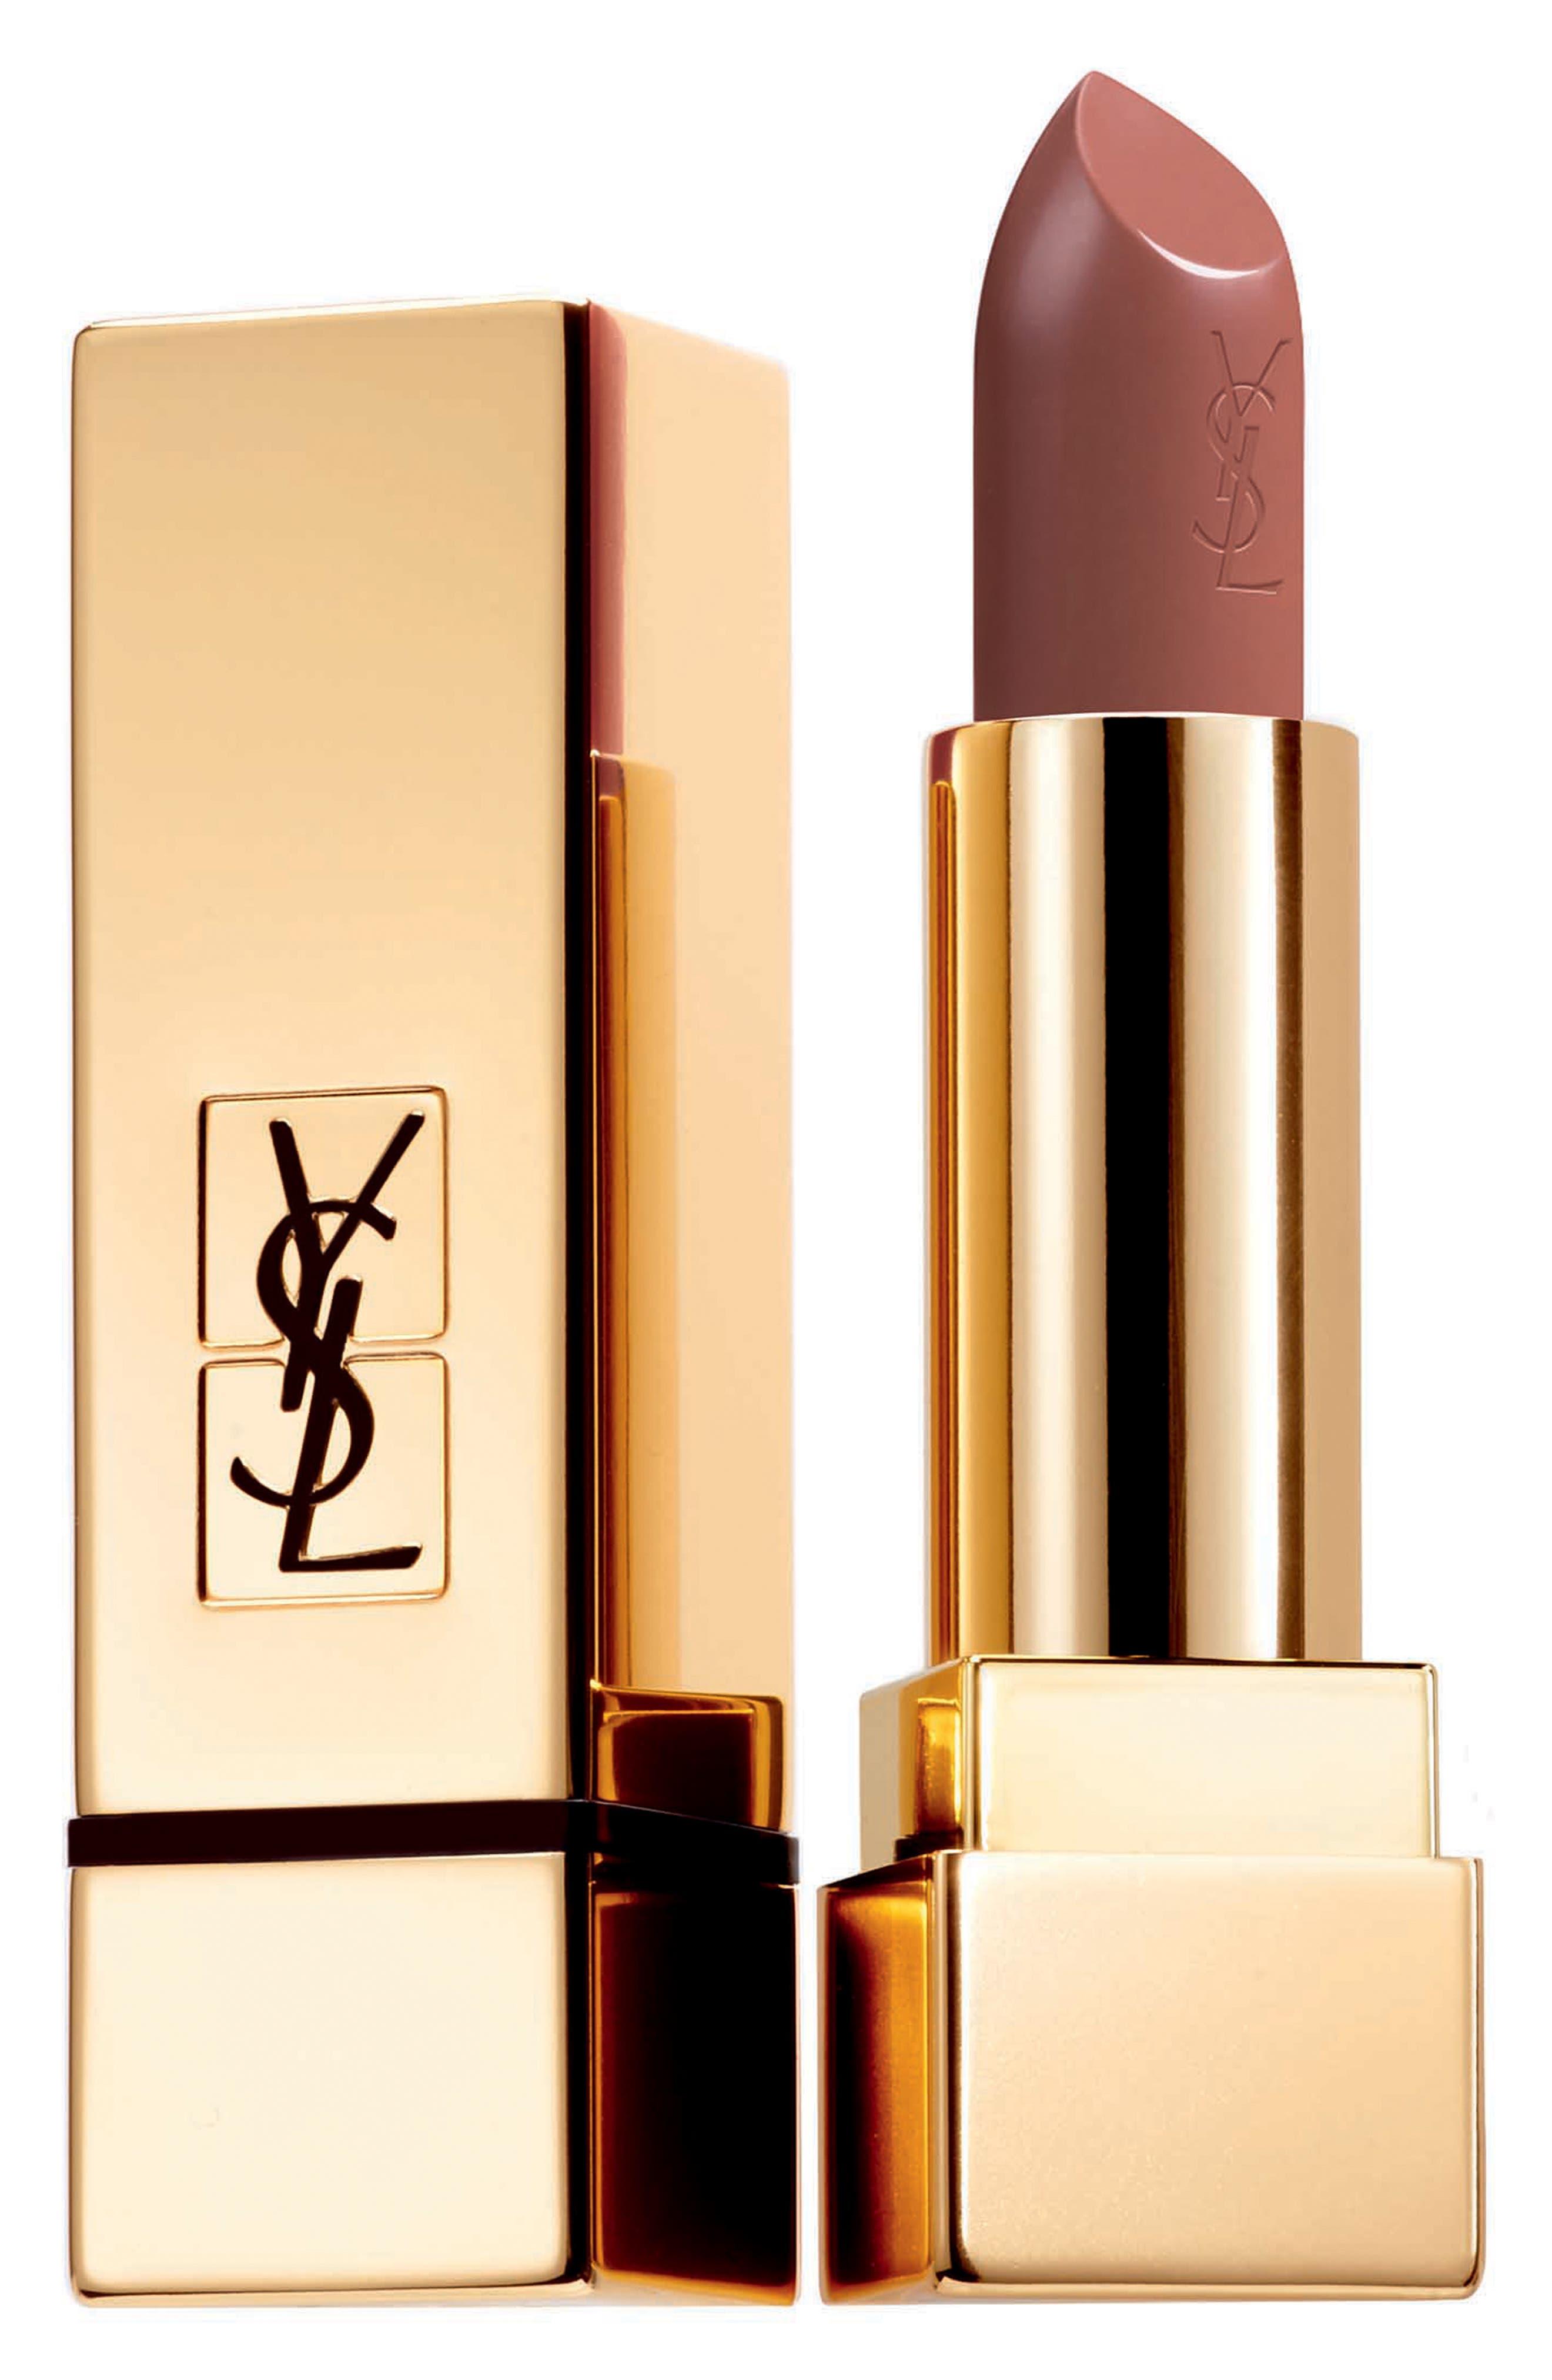 Yves Saint Laurent Rouge Pur Couture Satin Lipstick - 53 Beige Promenade